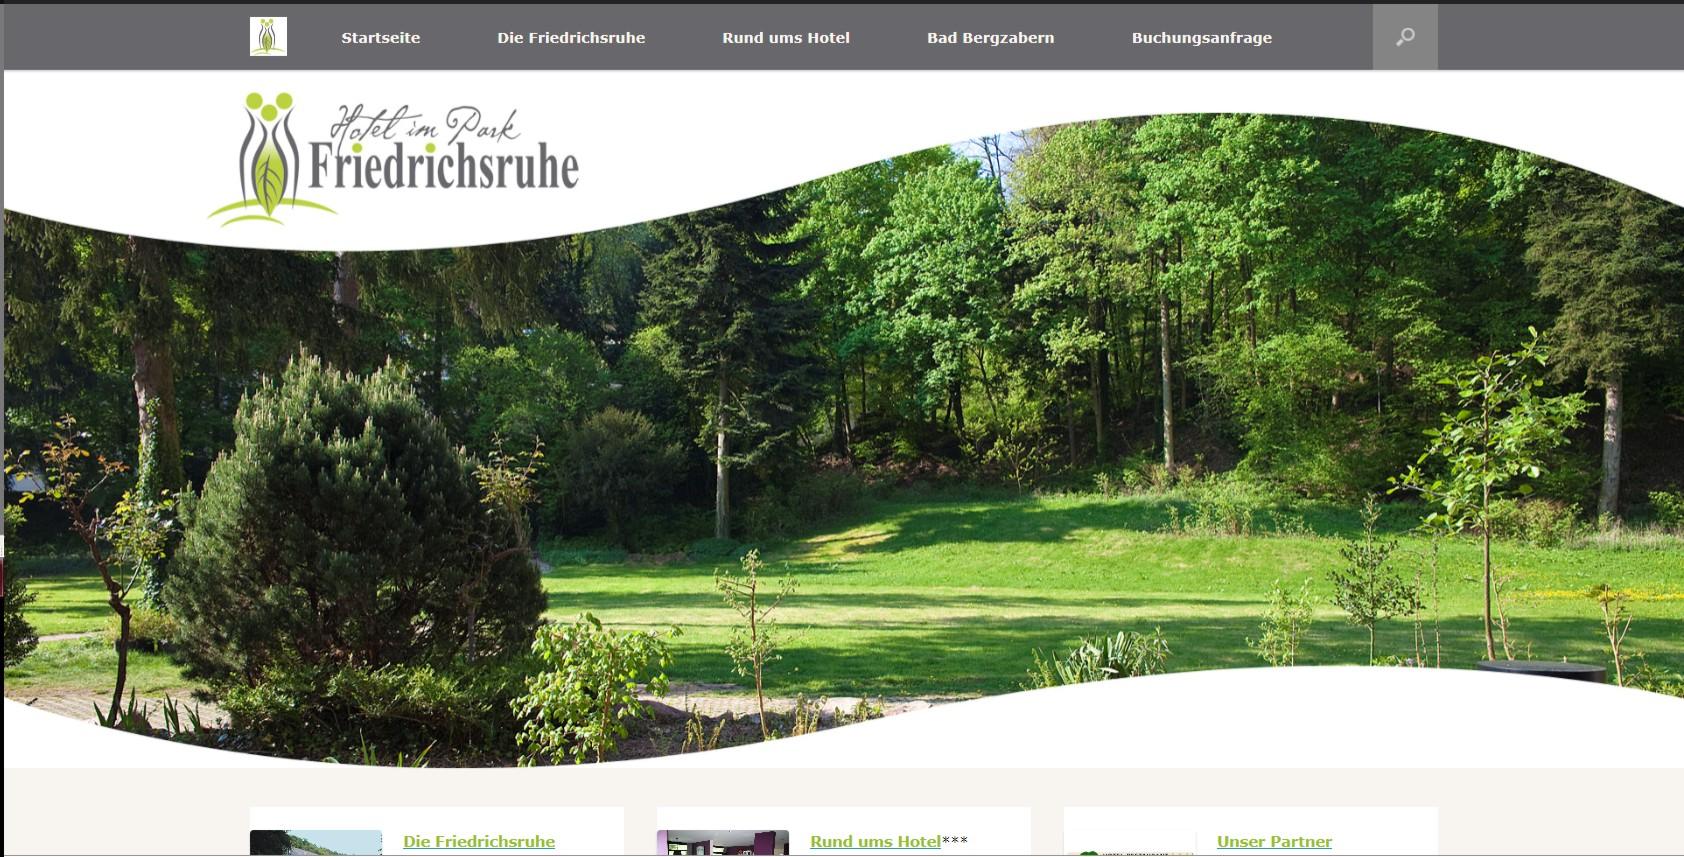 Bild Website Hotel im Park Friedrichsruhe Bad-Bergzabern